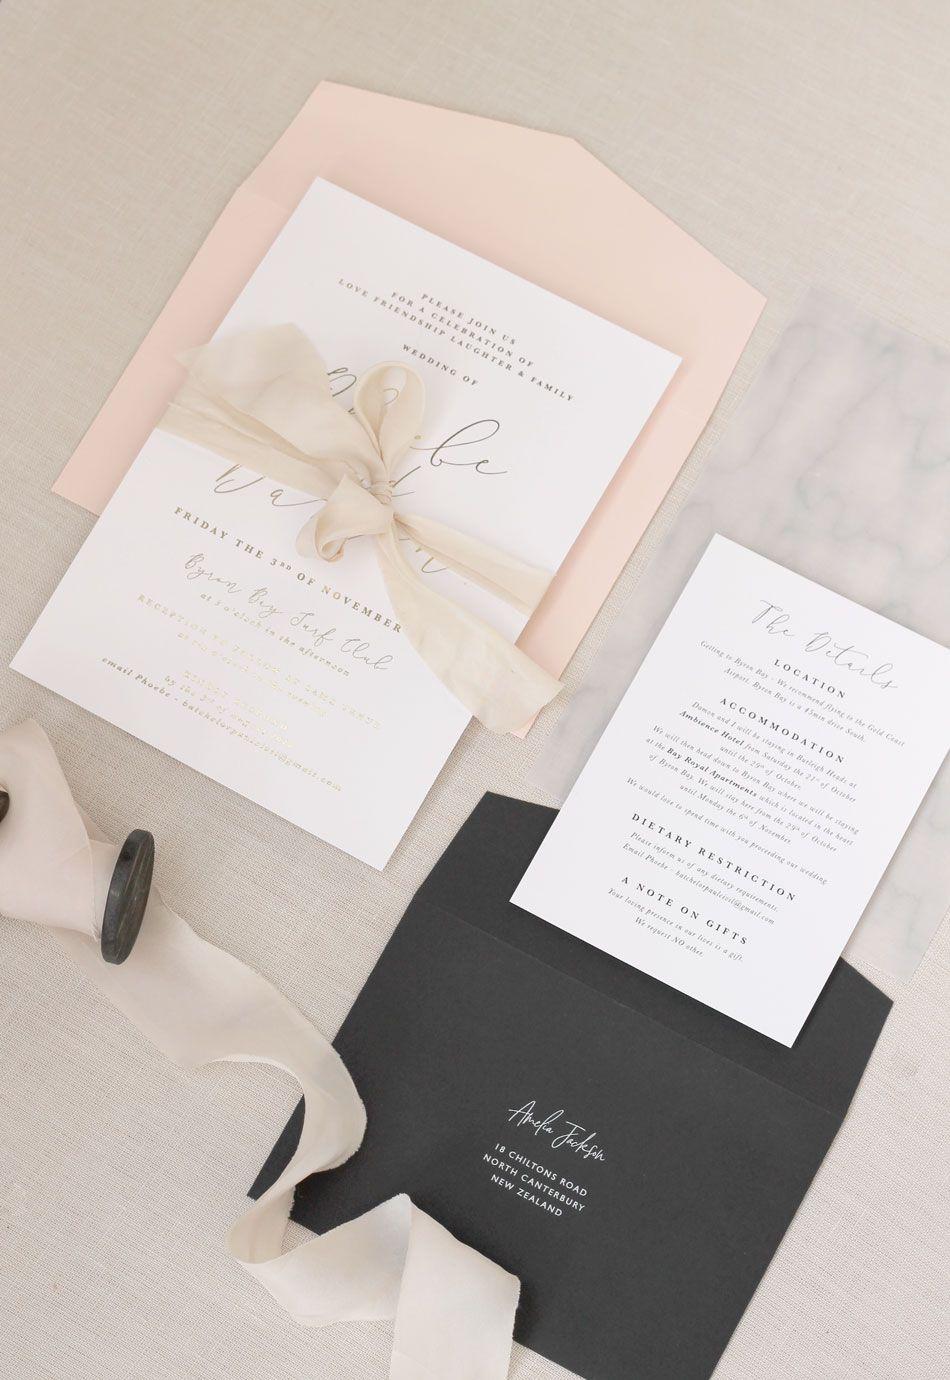 Just My Type Wedding Invitation Stationery Nz Blush Pink Gold Foil Marb Wedding Invitations Stationery Wedding Invitations Wedding Invitations Modern Chic